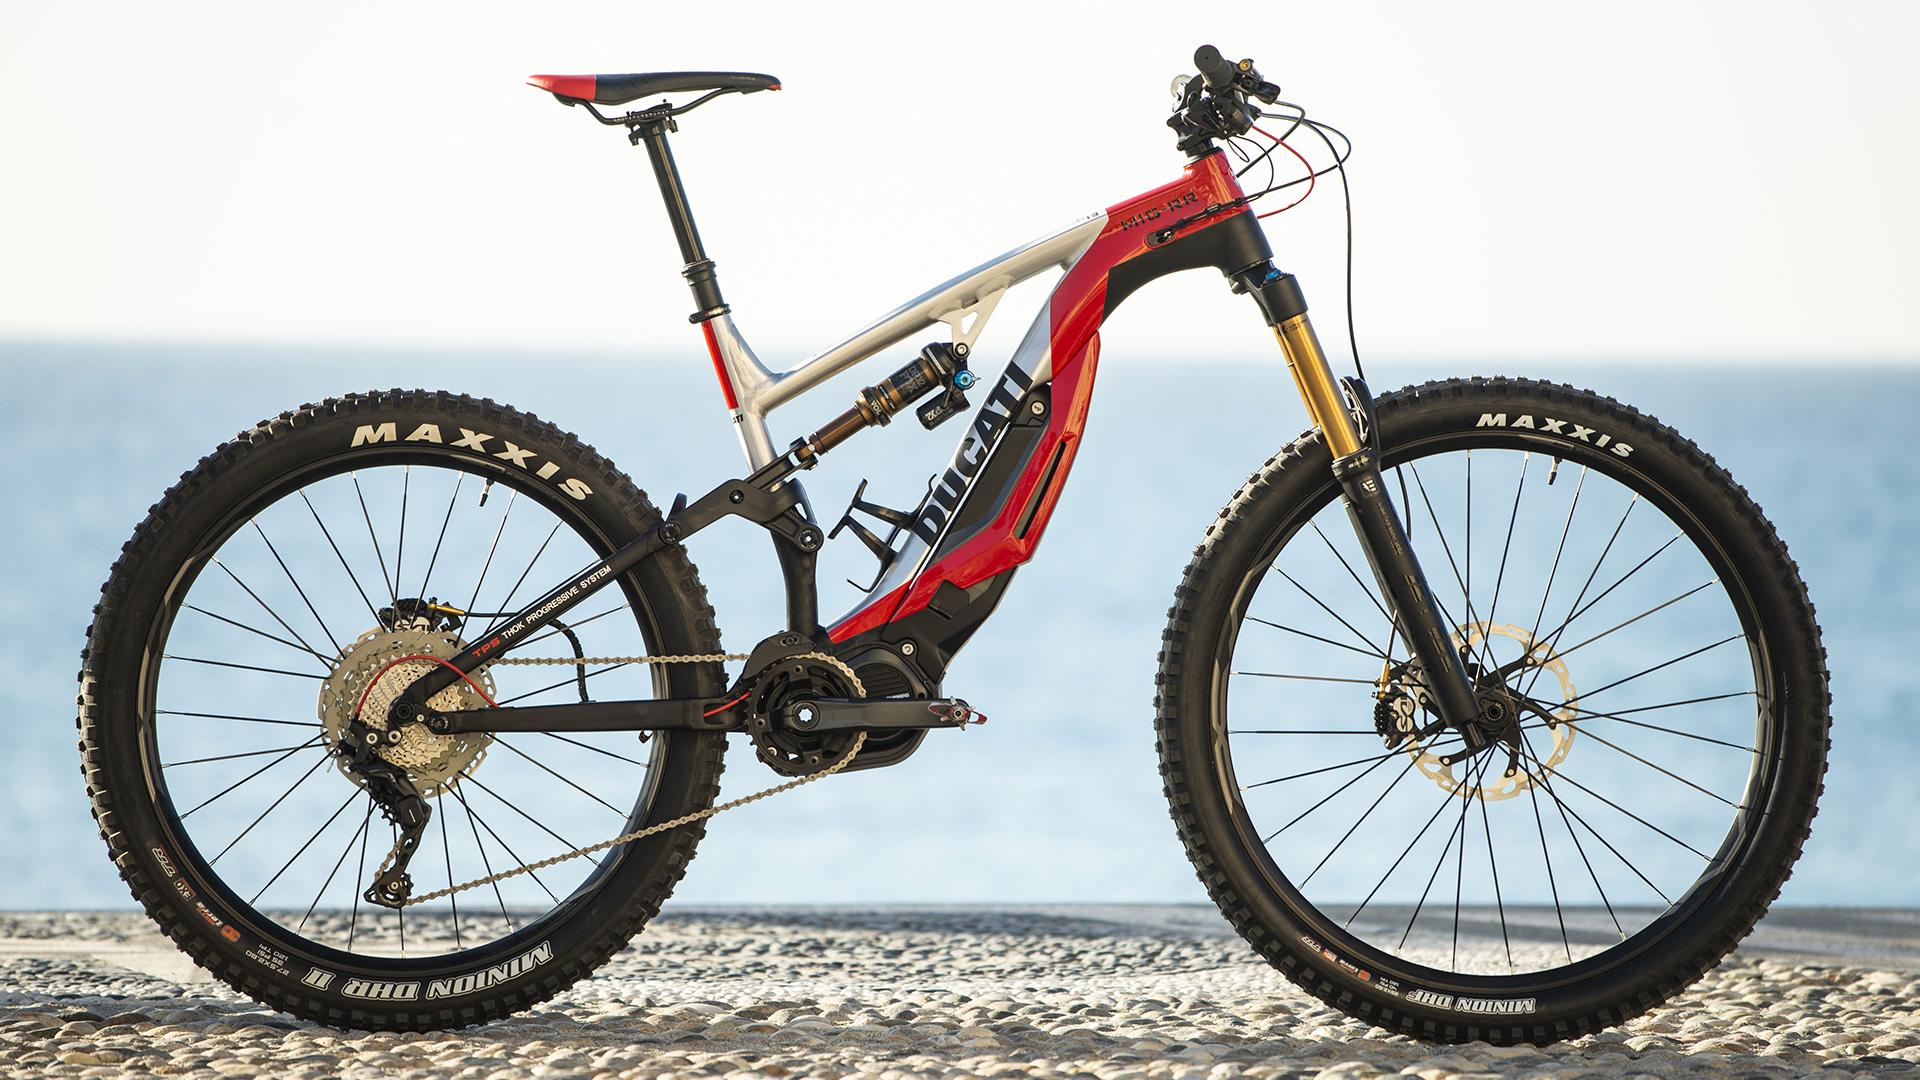 Ducati Mig Rr E Bike Enduro E Mtbs By Ducati